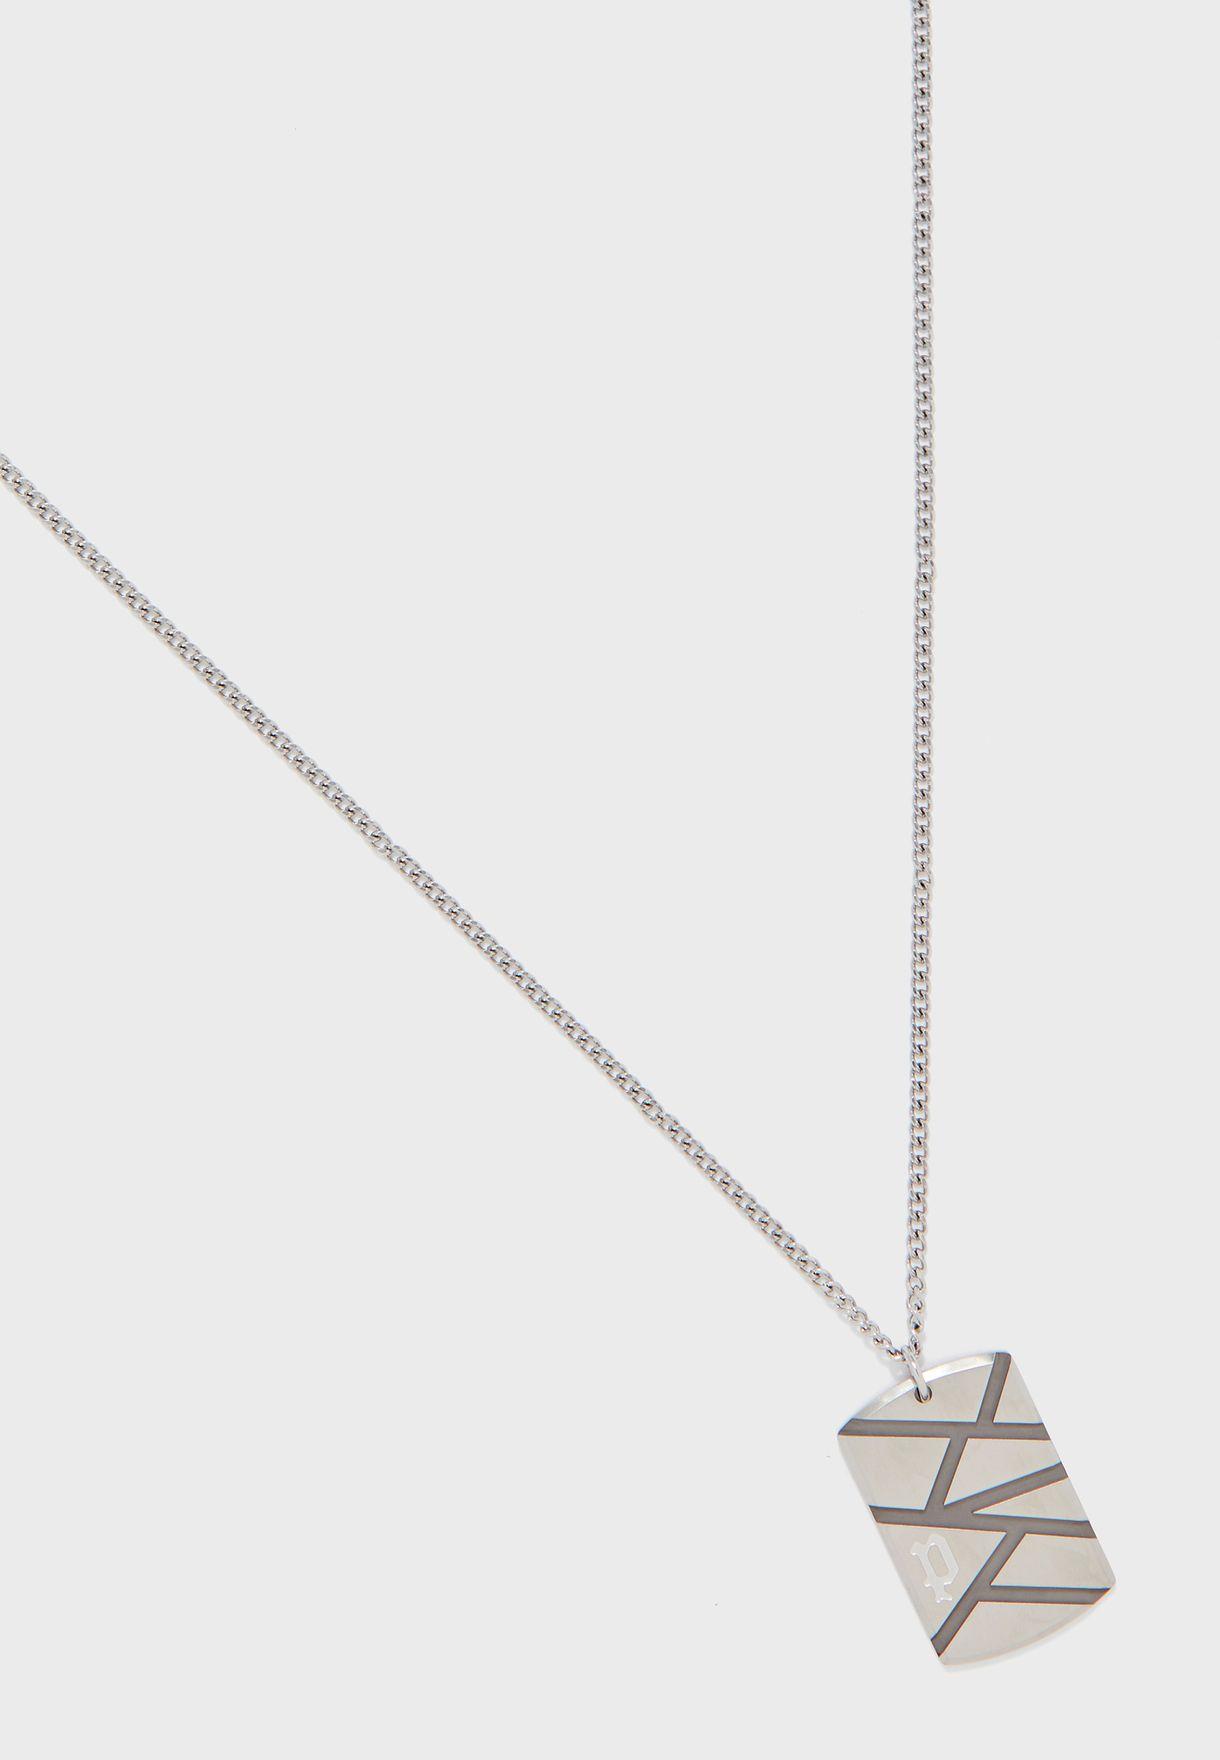 P PJ 26485PSB-02 Necklace